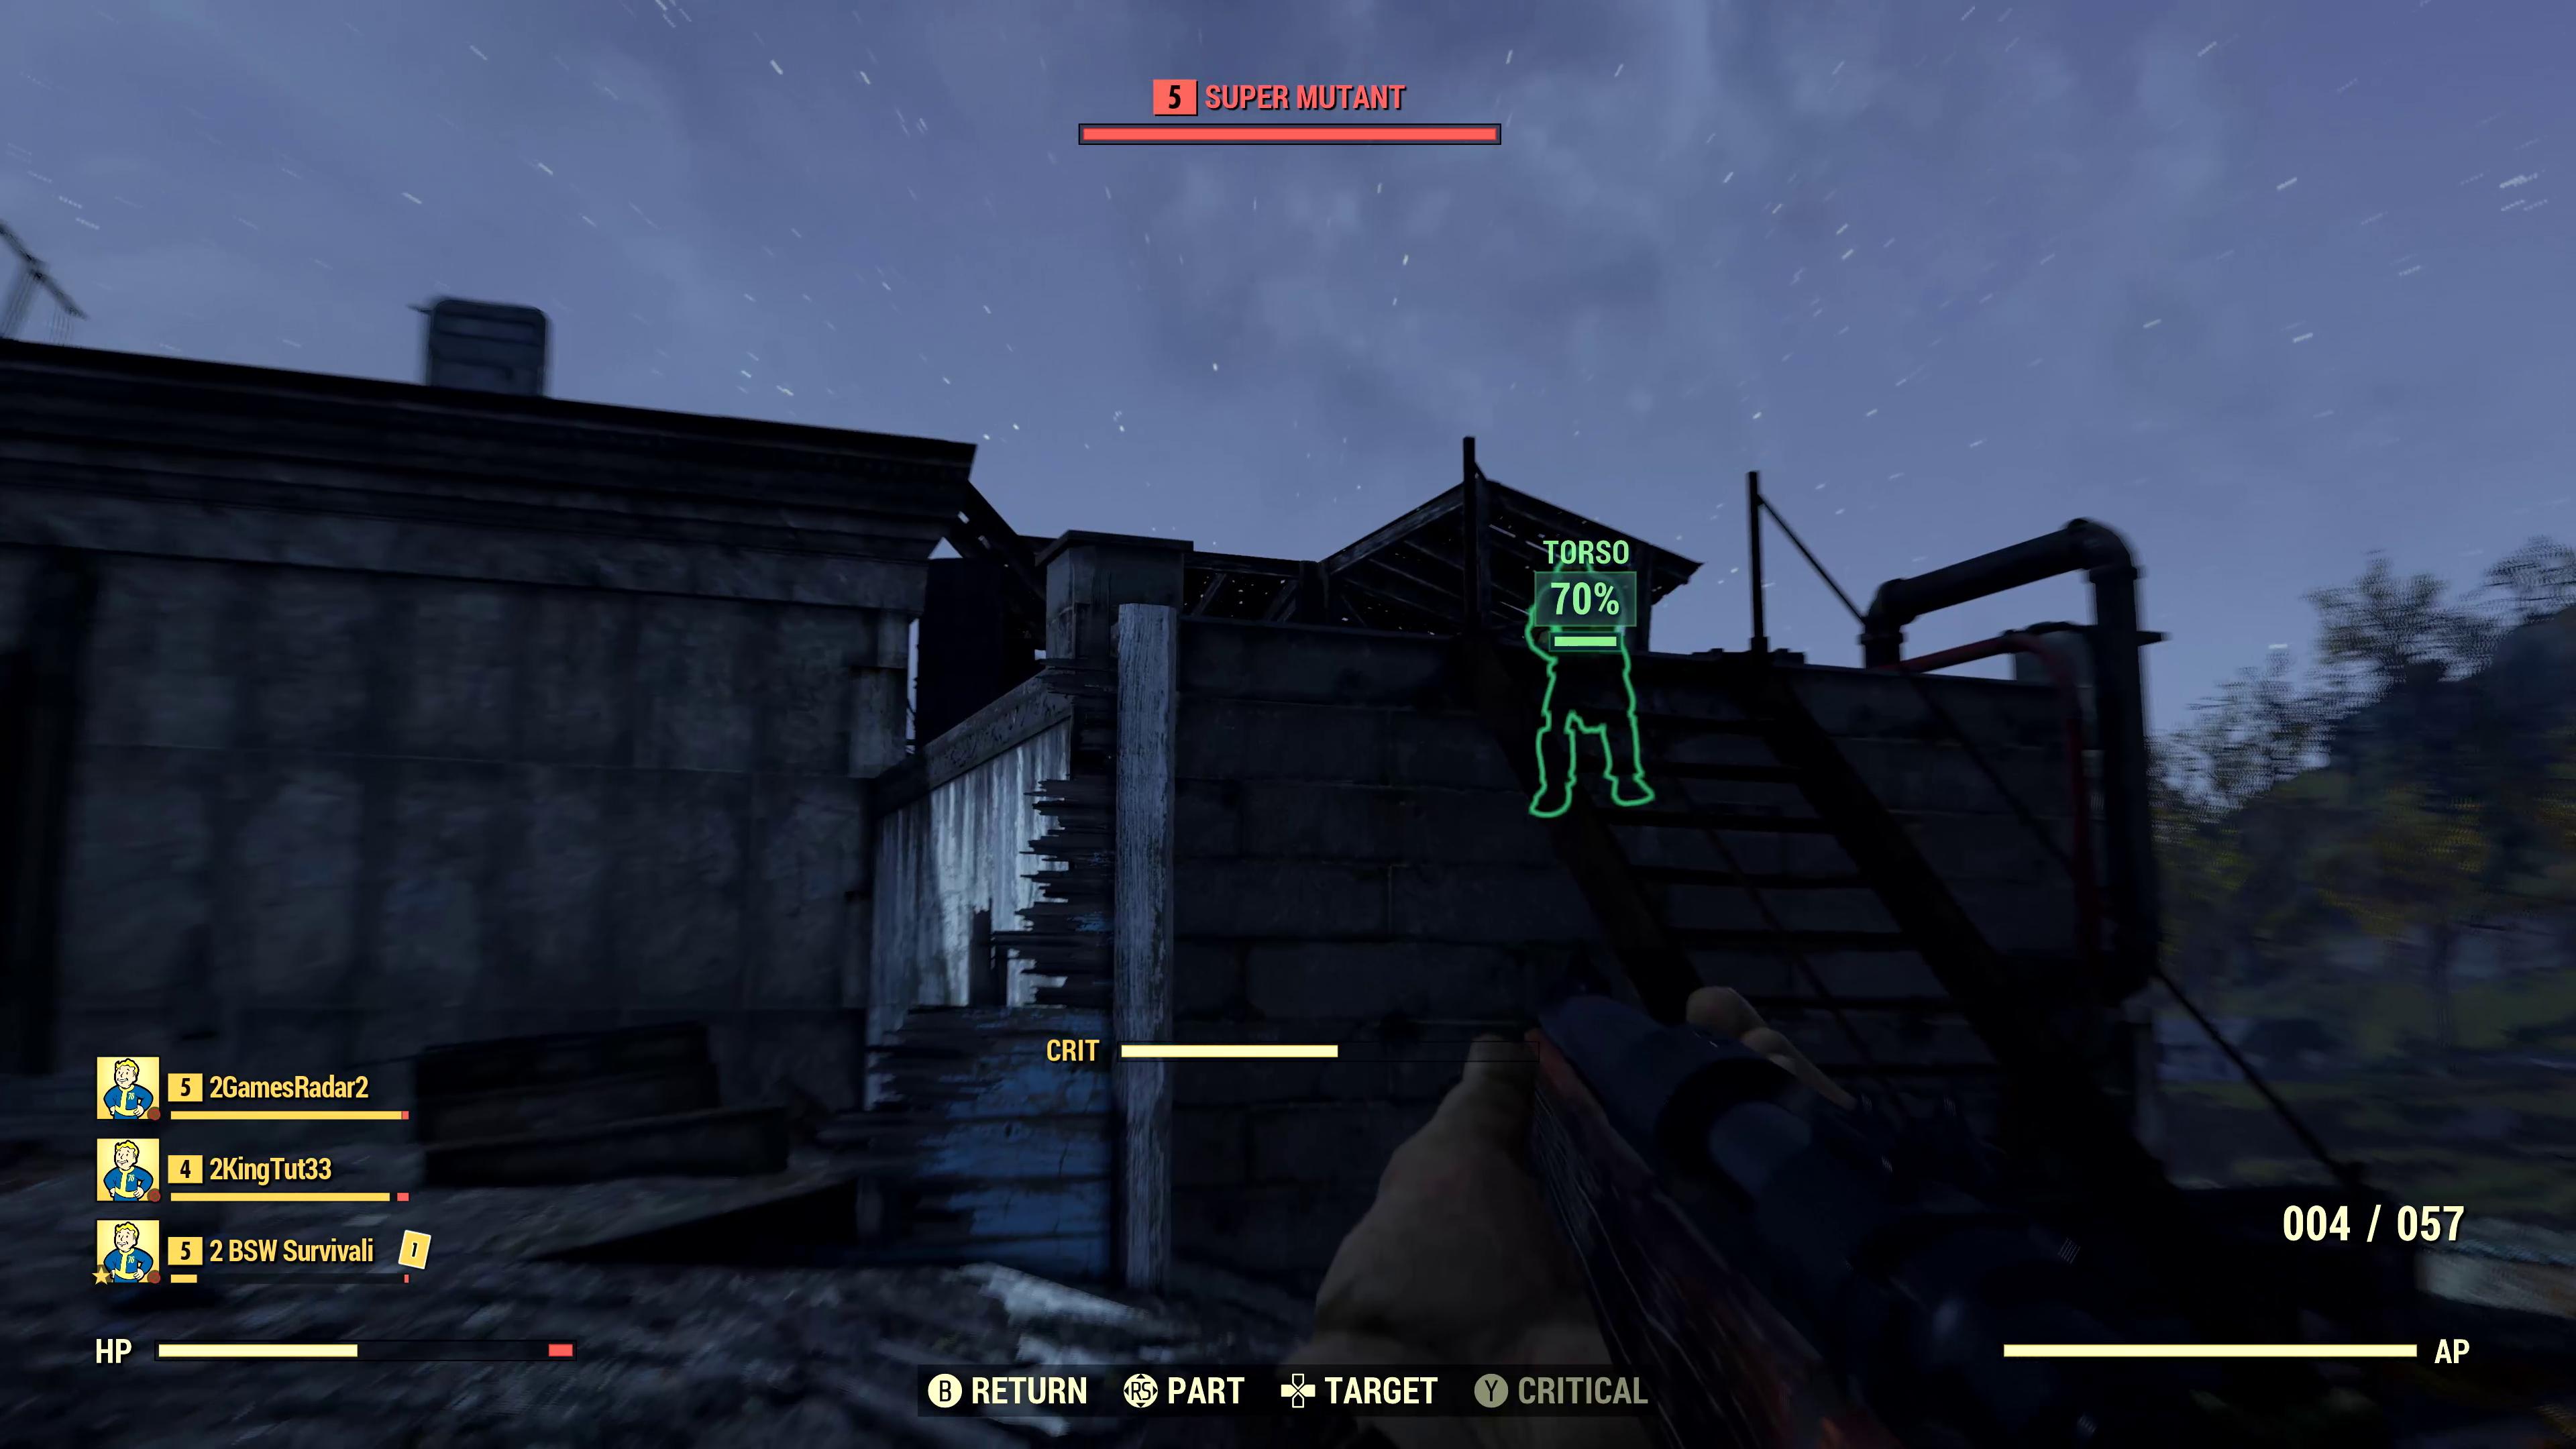 Fallout 76 god mode | Fallout 76 Glitch Guide  2019-05-07